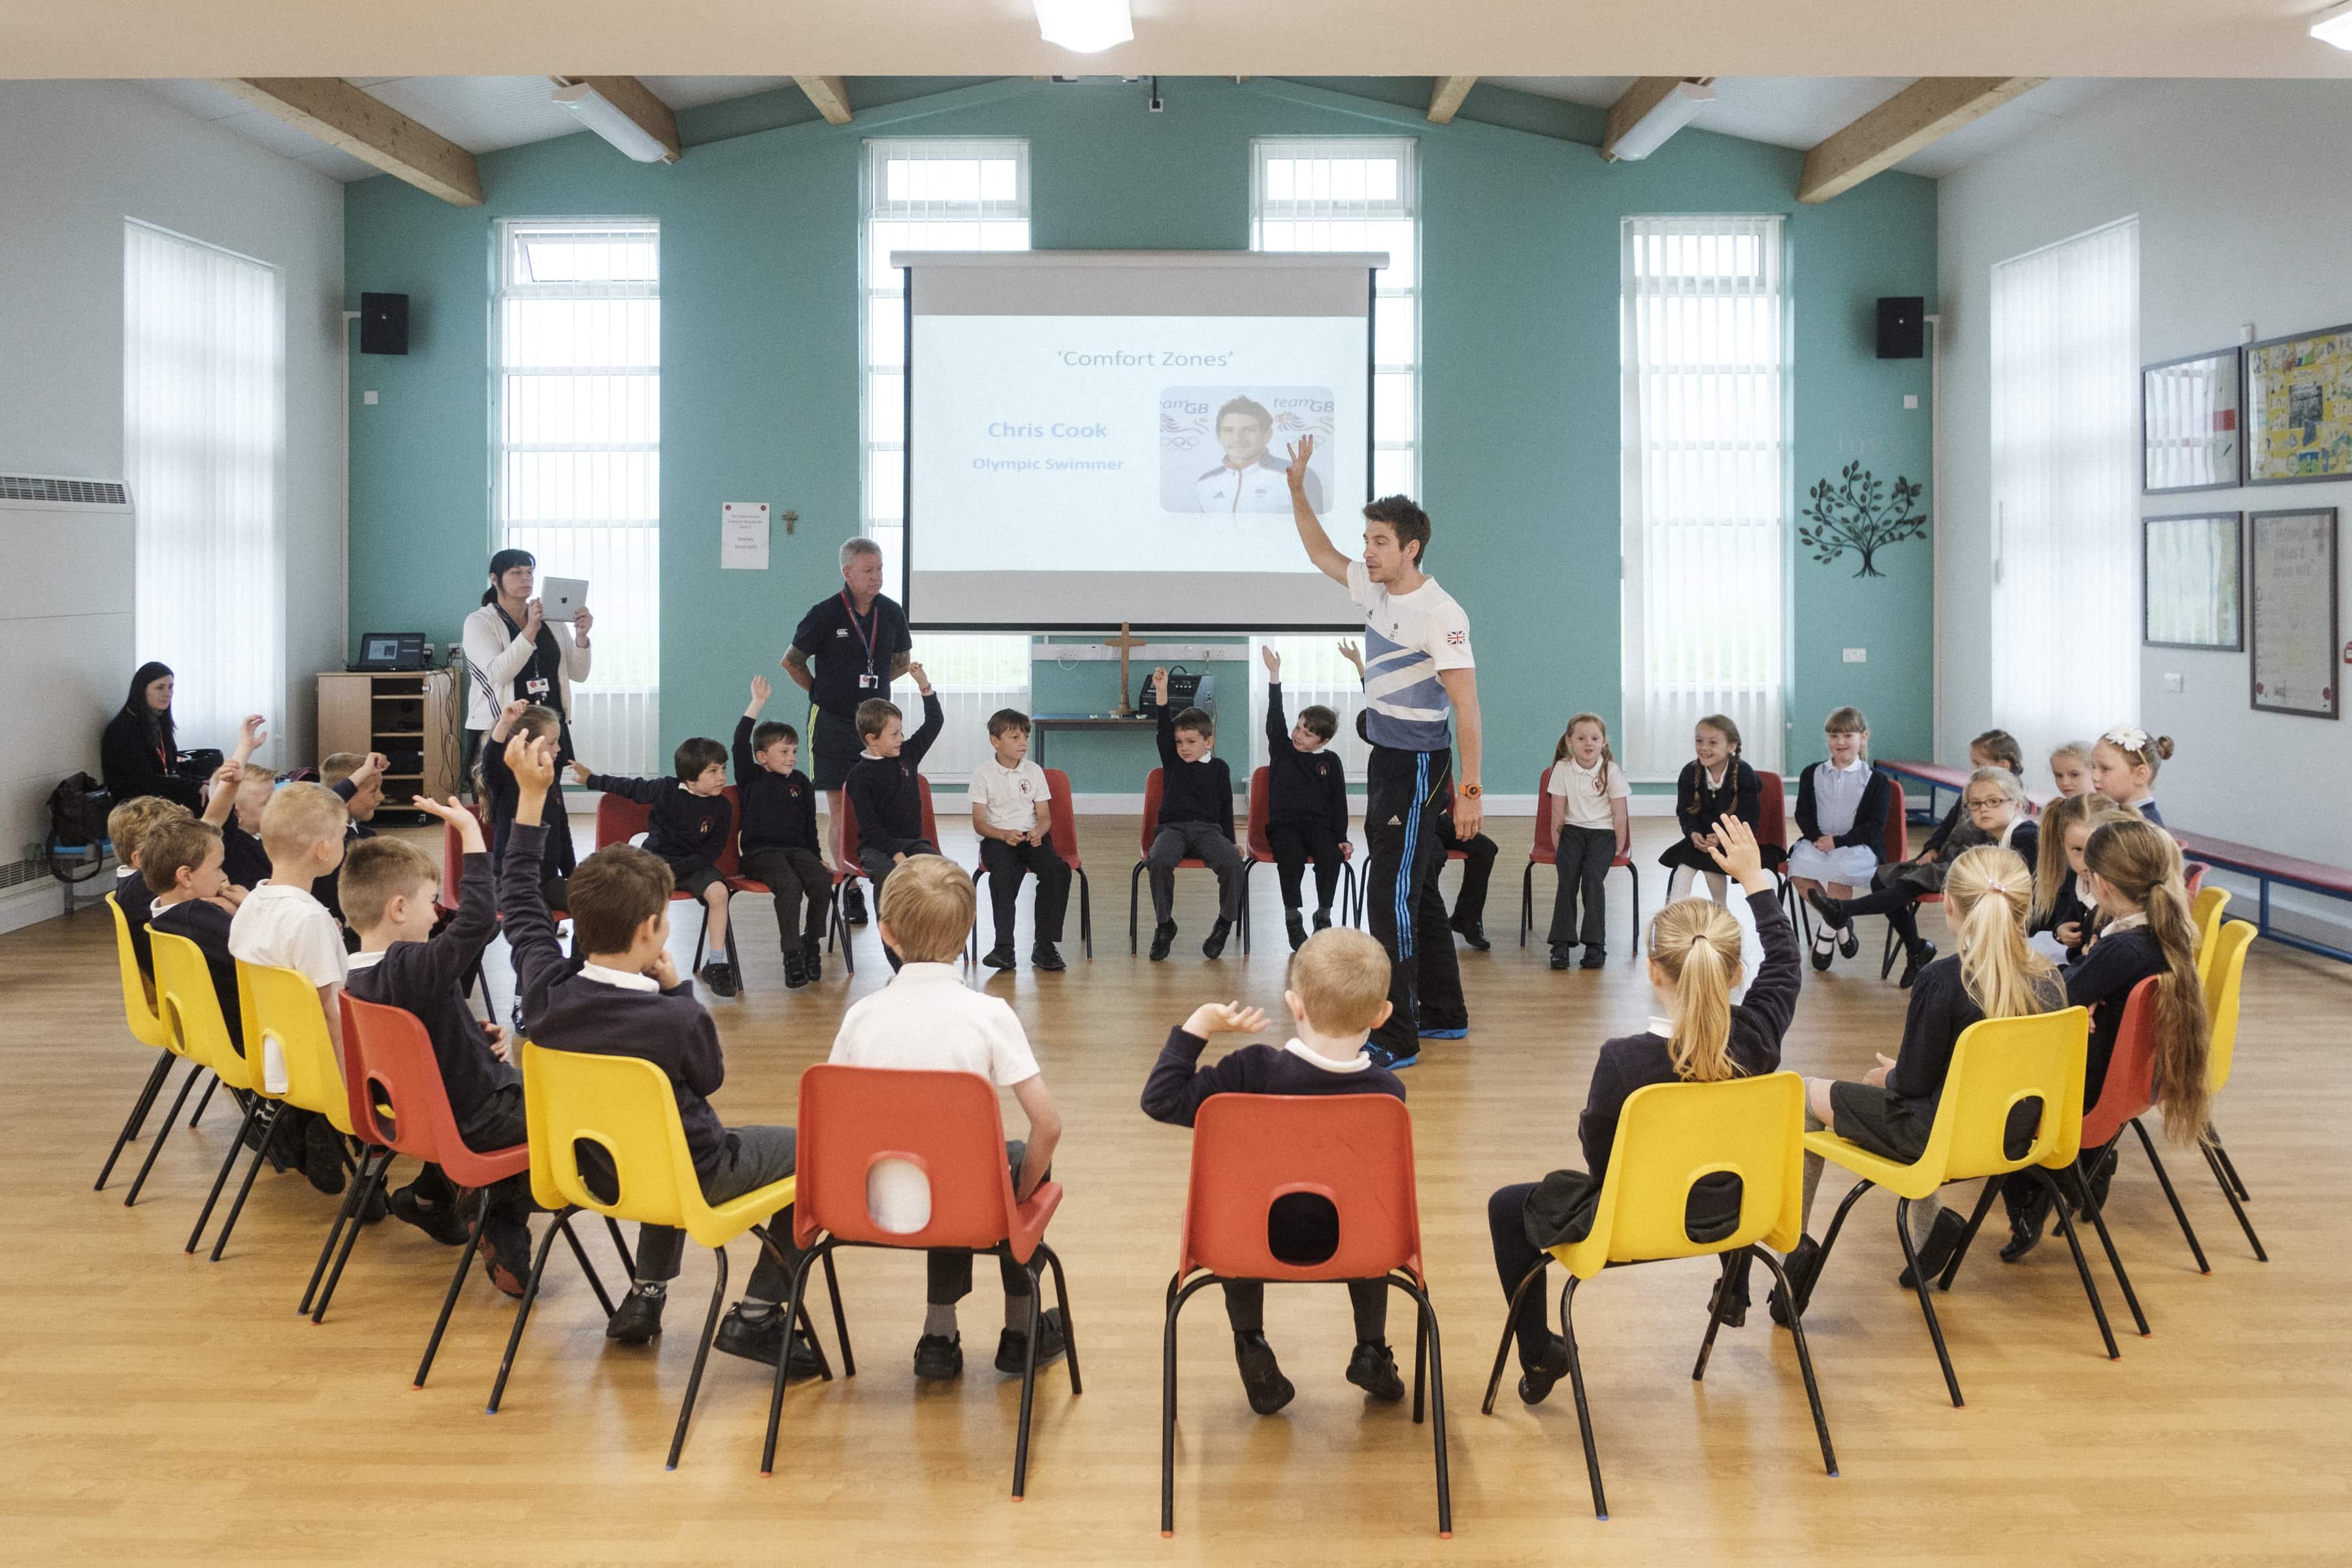 ex Olympian Chris Cooke inspiring a group of school children